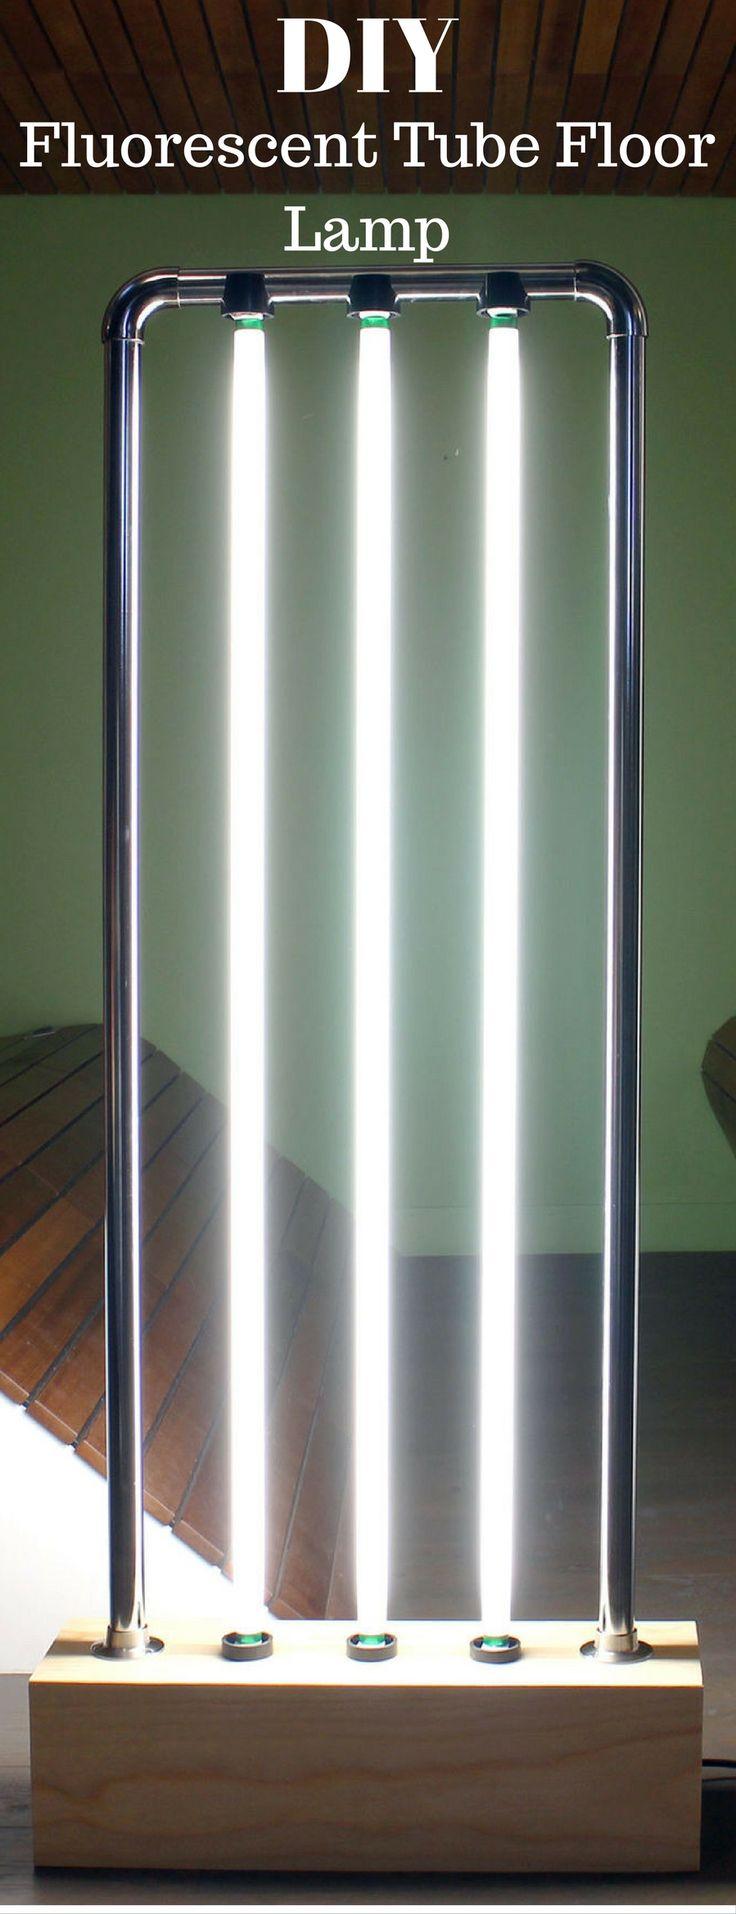 Fluorescent Tube Floor Lamp http://vid.staged.com/MLht